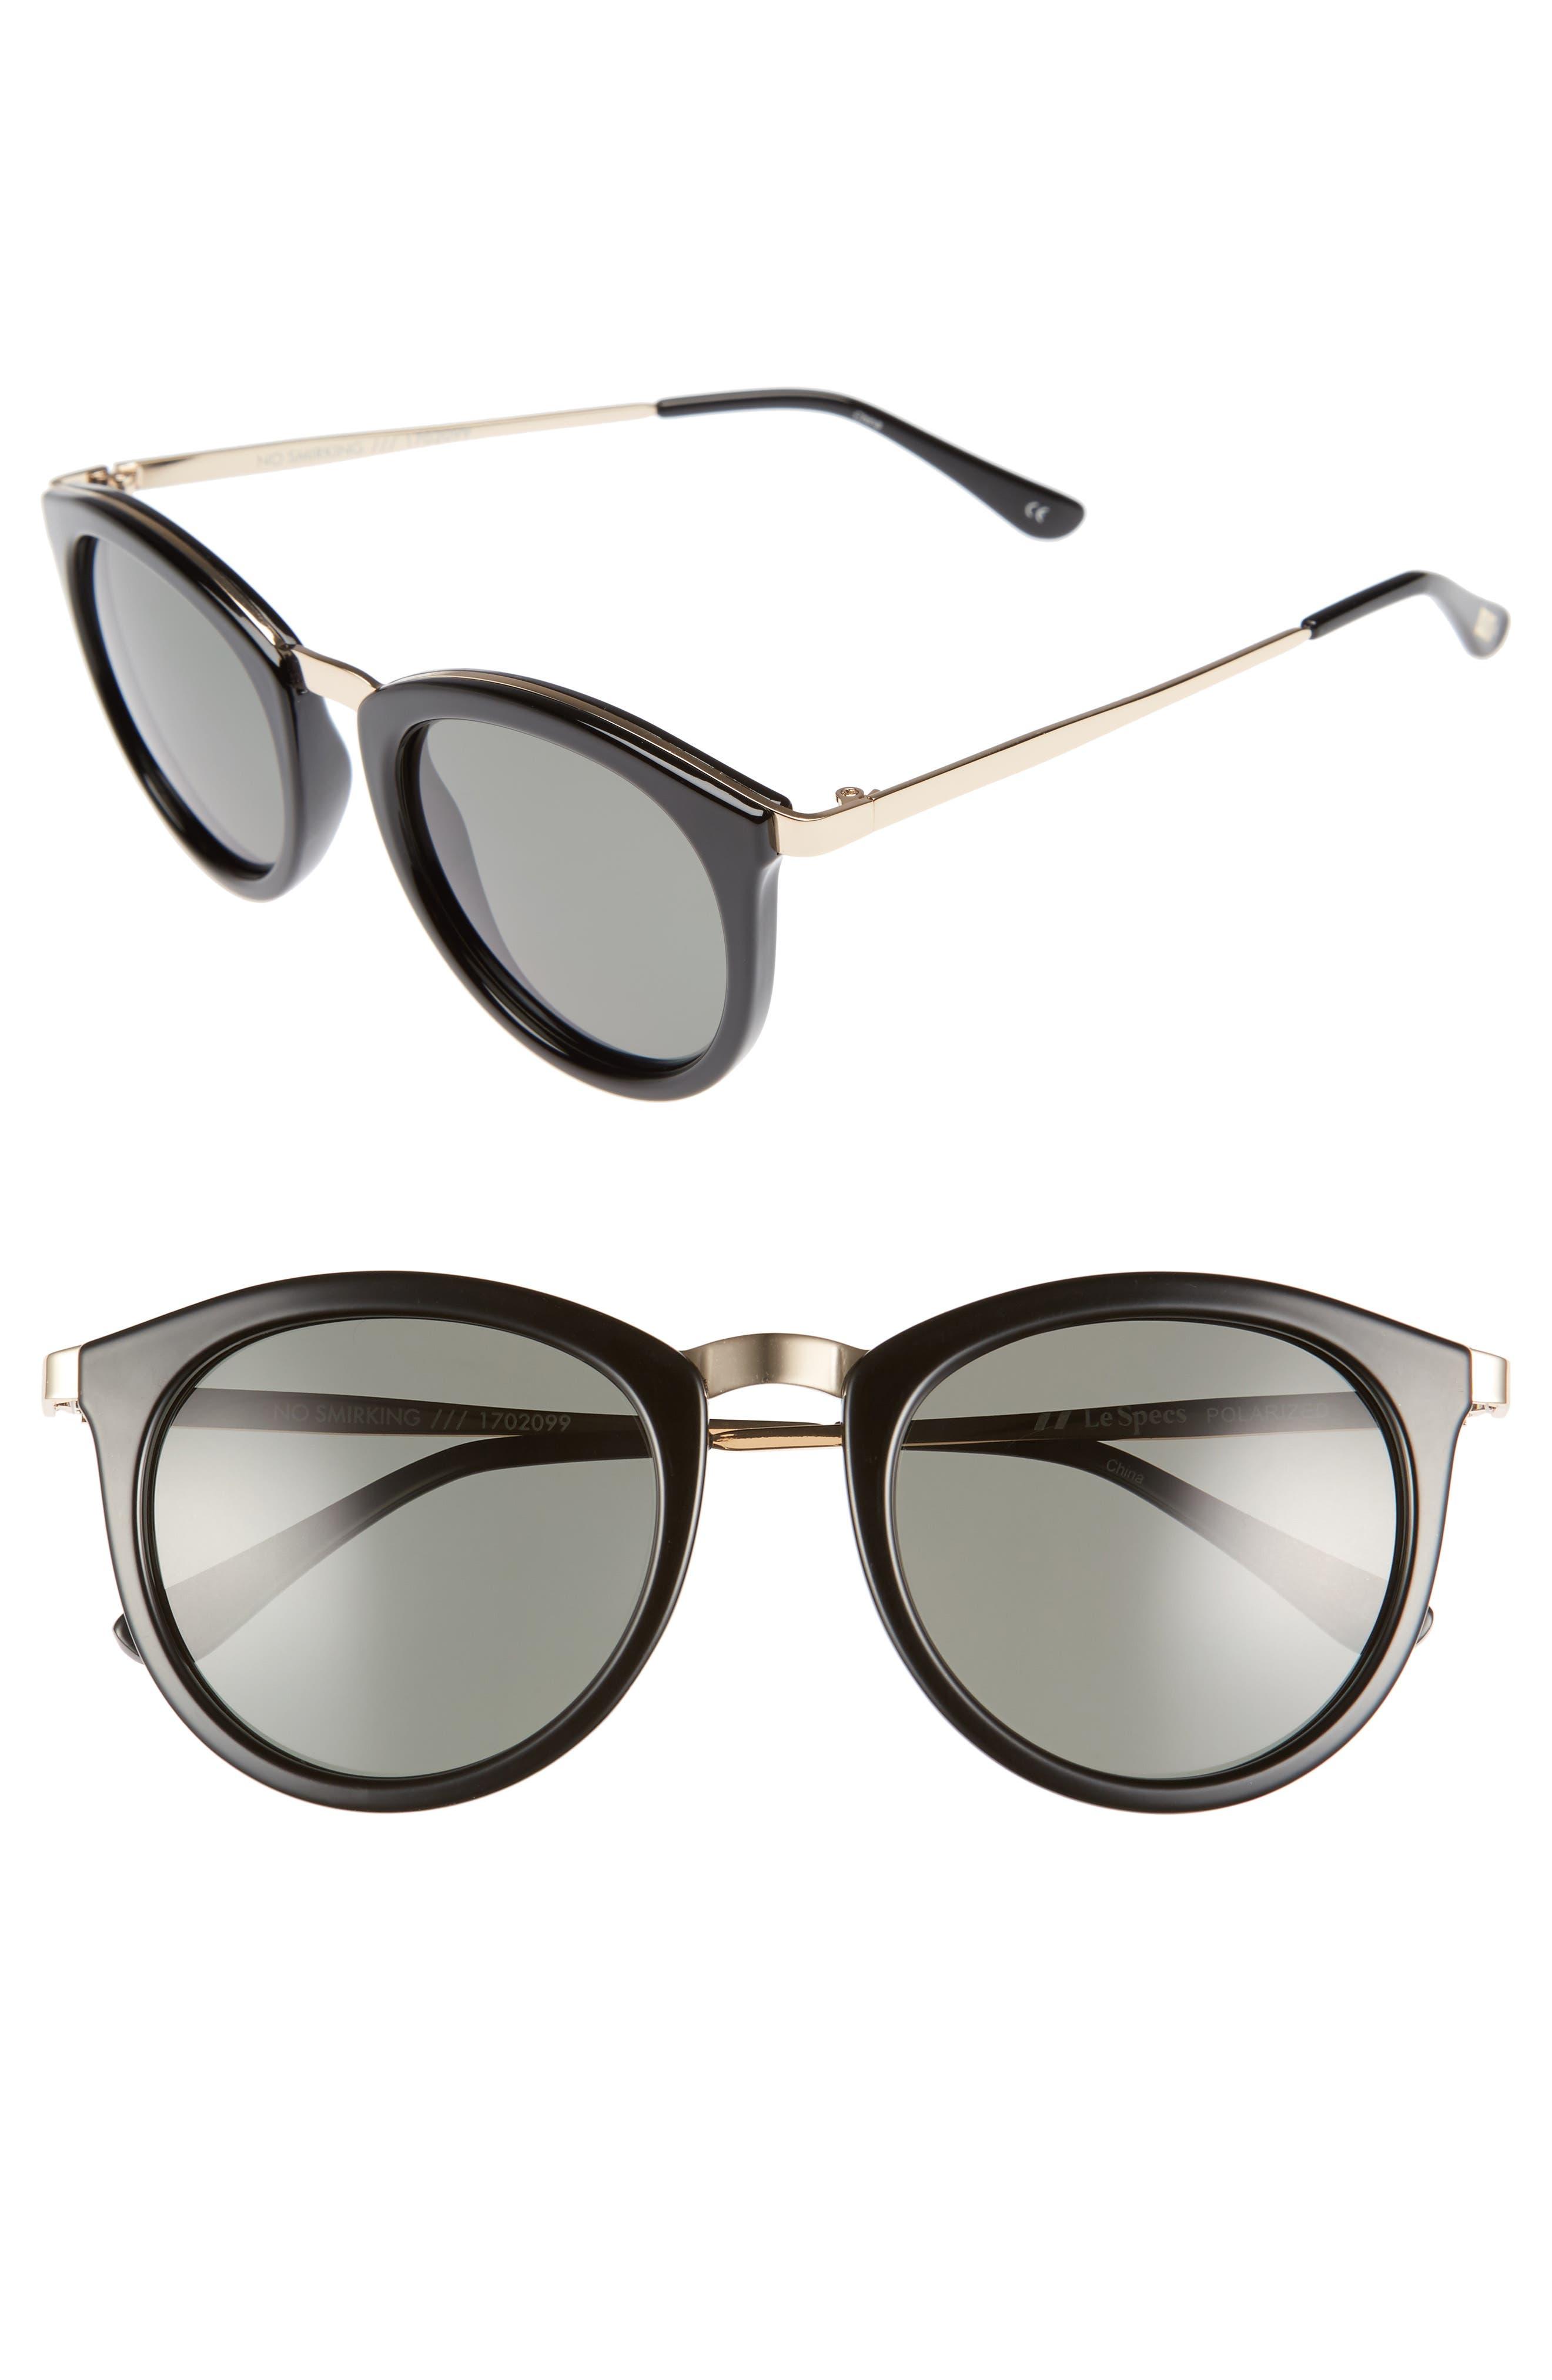 Alternate Image 1 Selected - Le Specs No Smirking 51mm Polarized Sunglasses